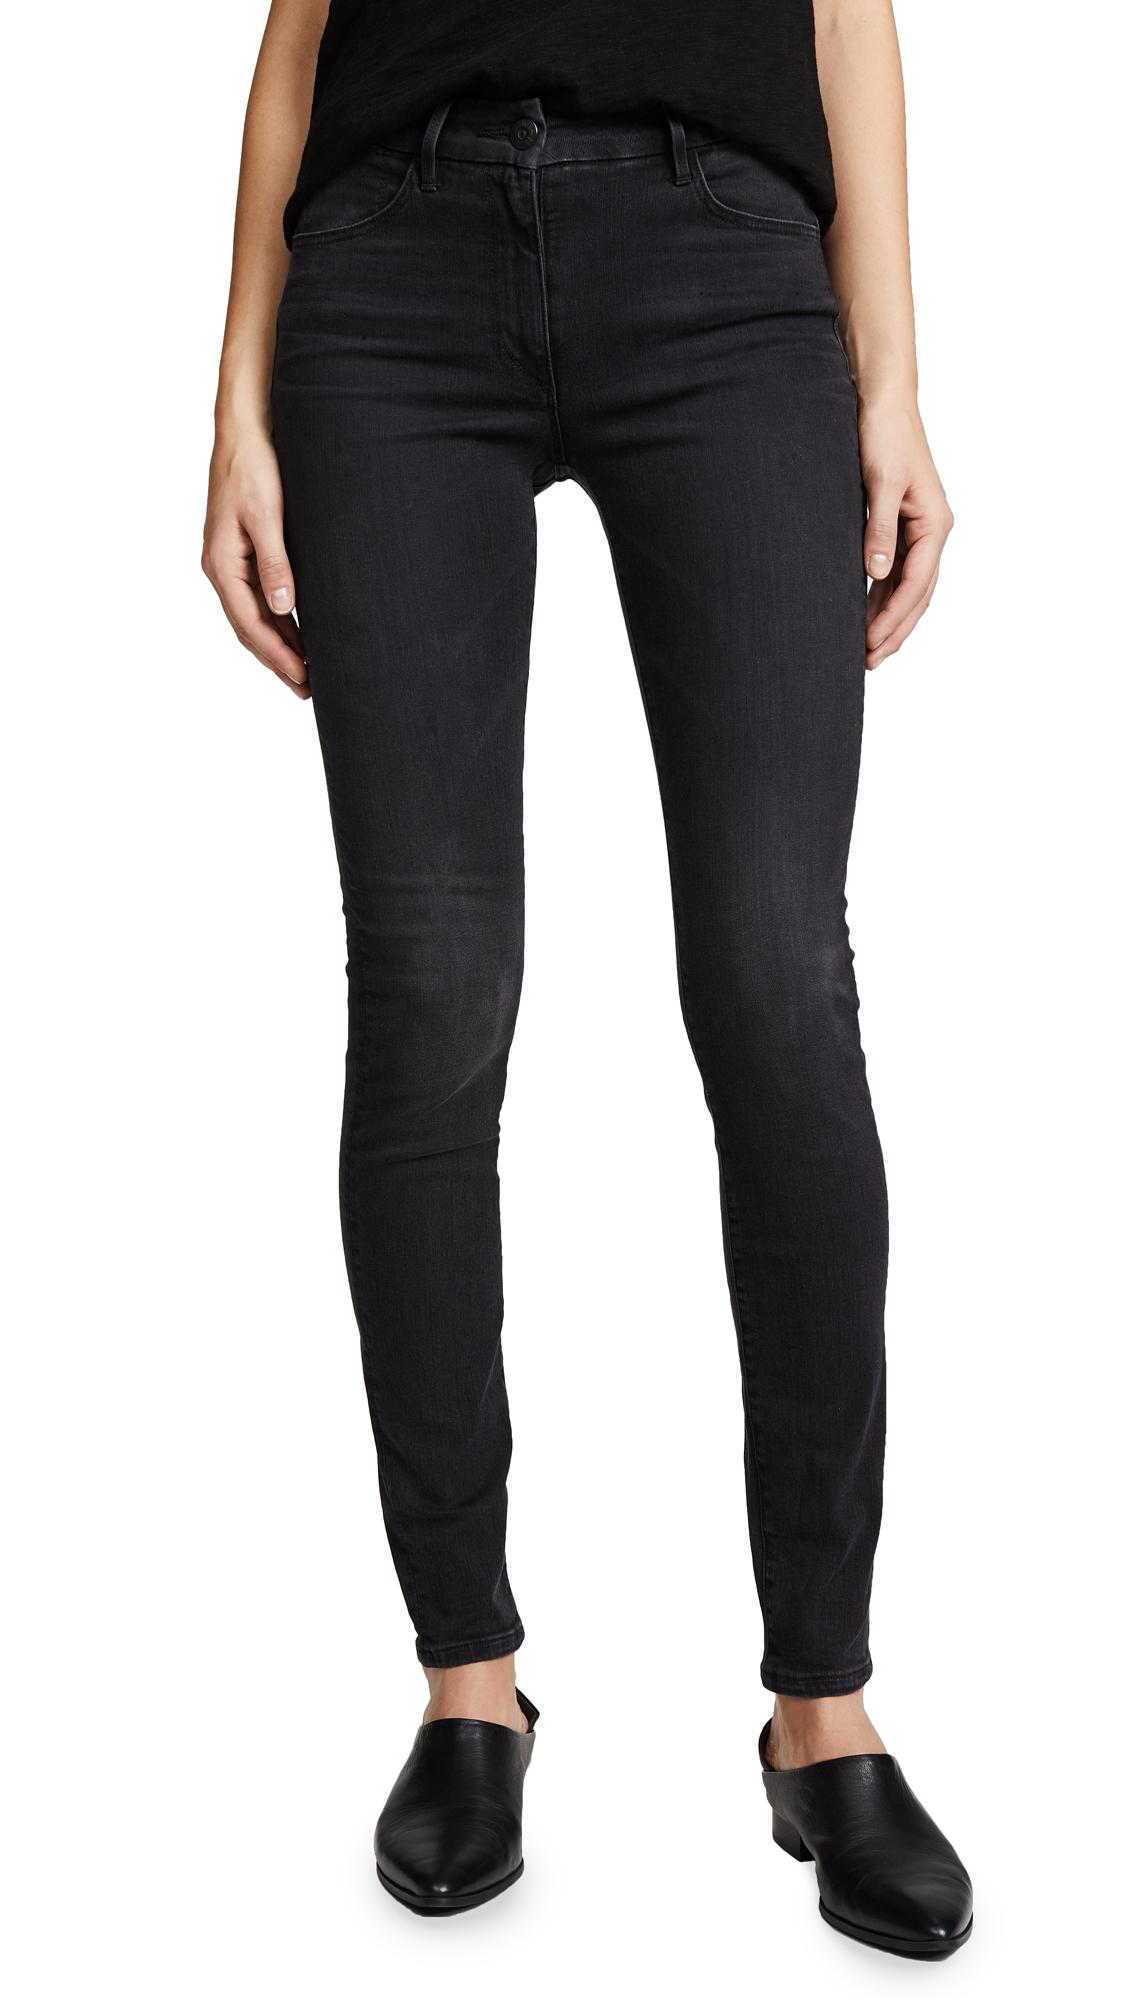 3x1 W3 Channel Seam High Rise Skinny Jeans